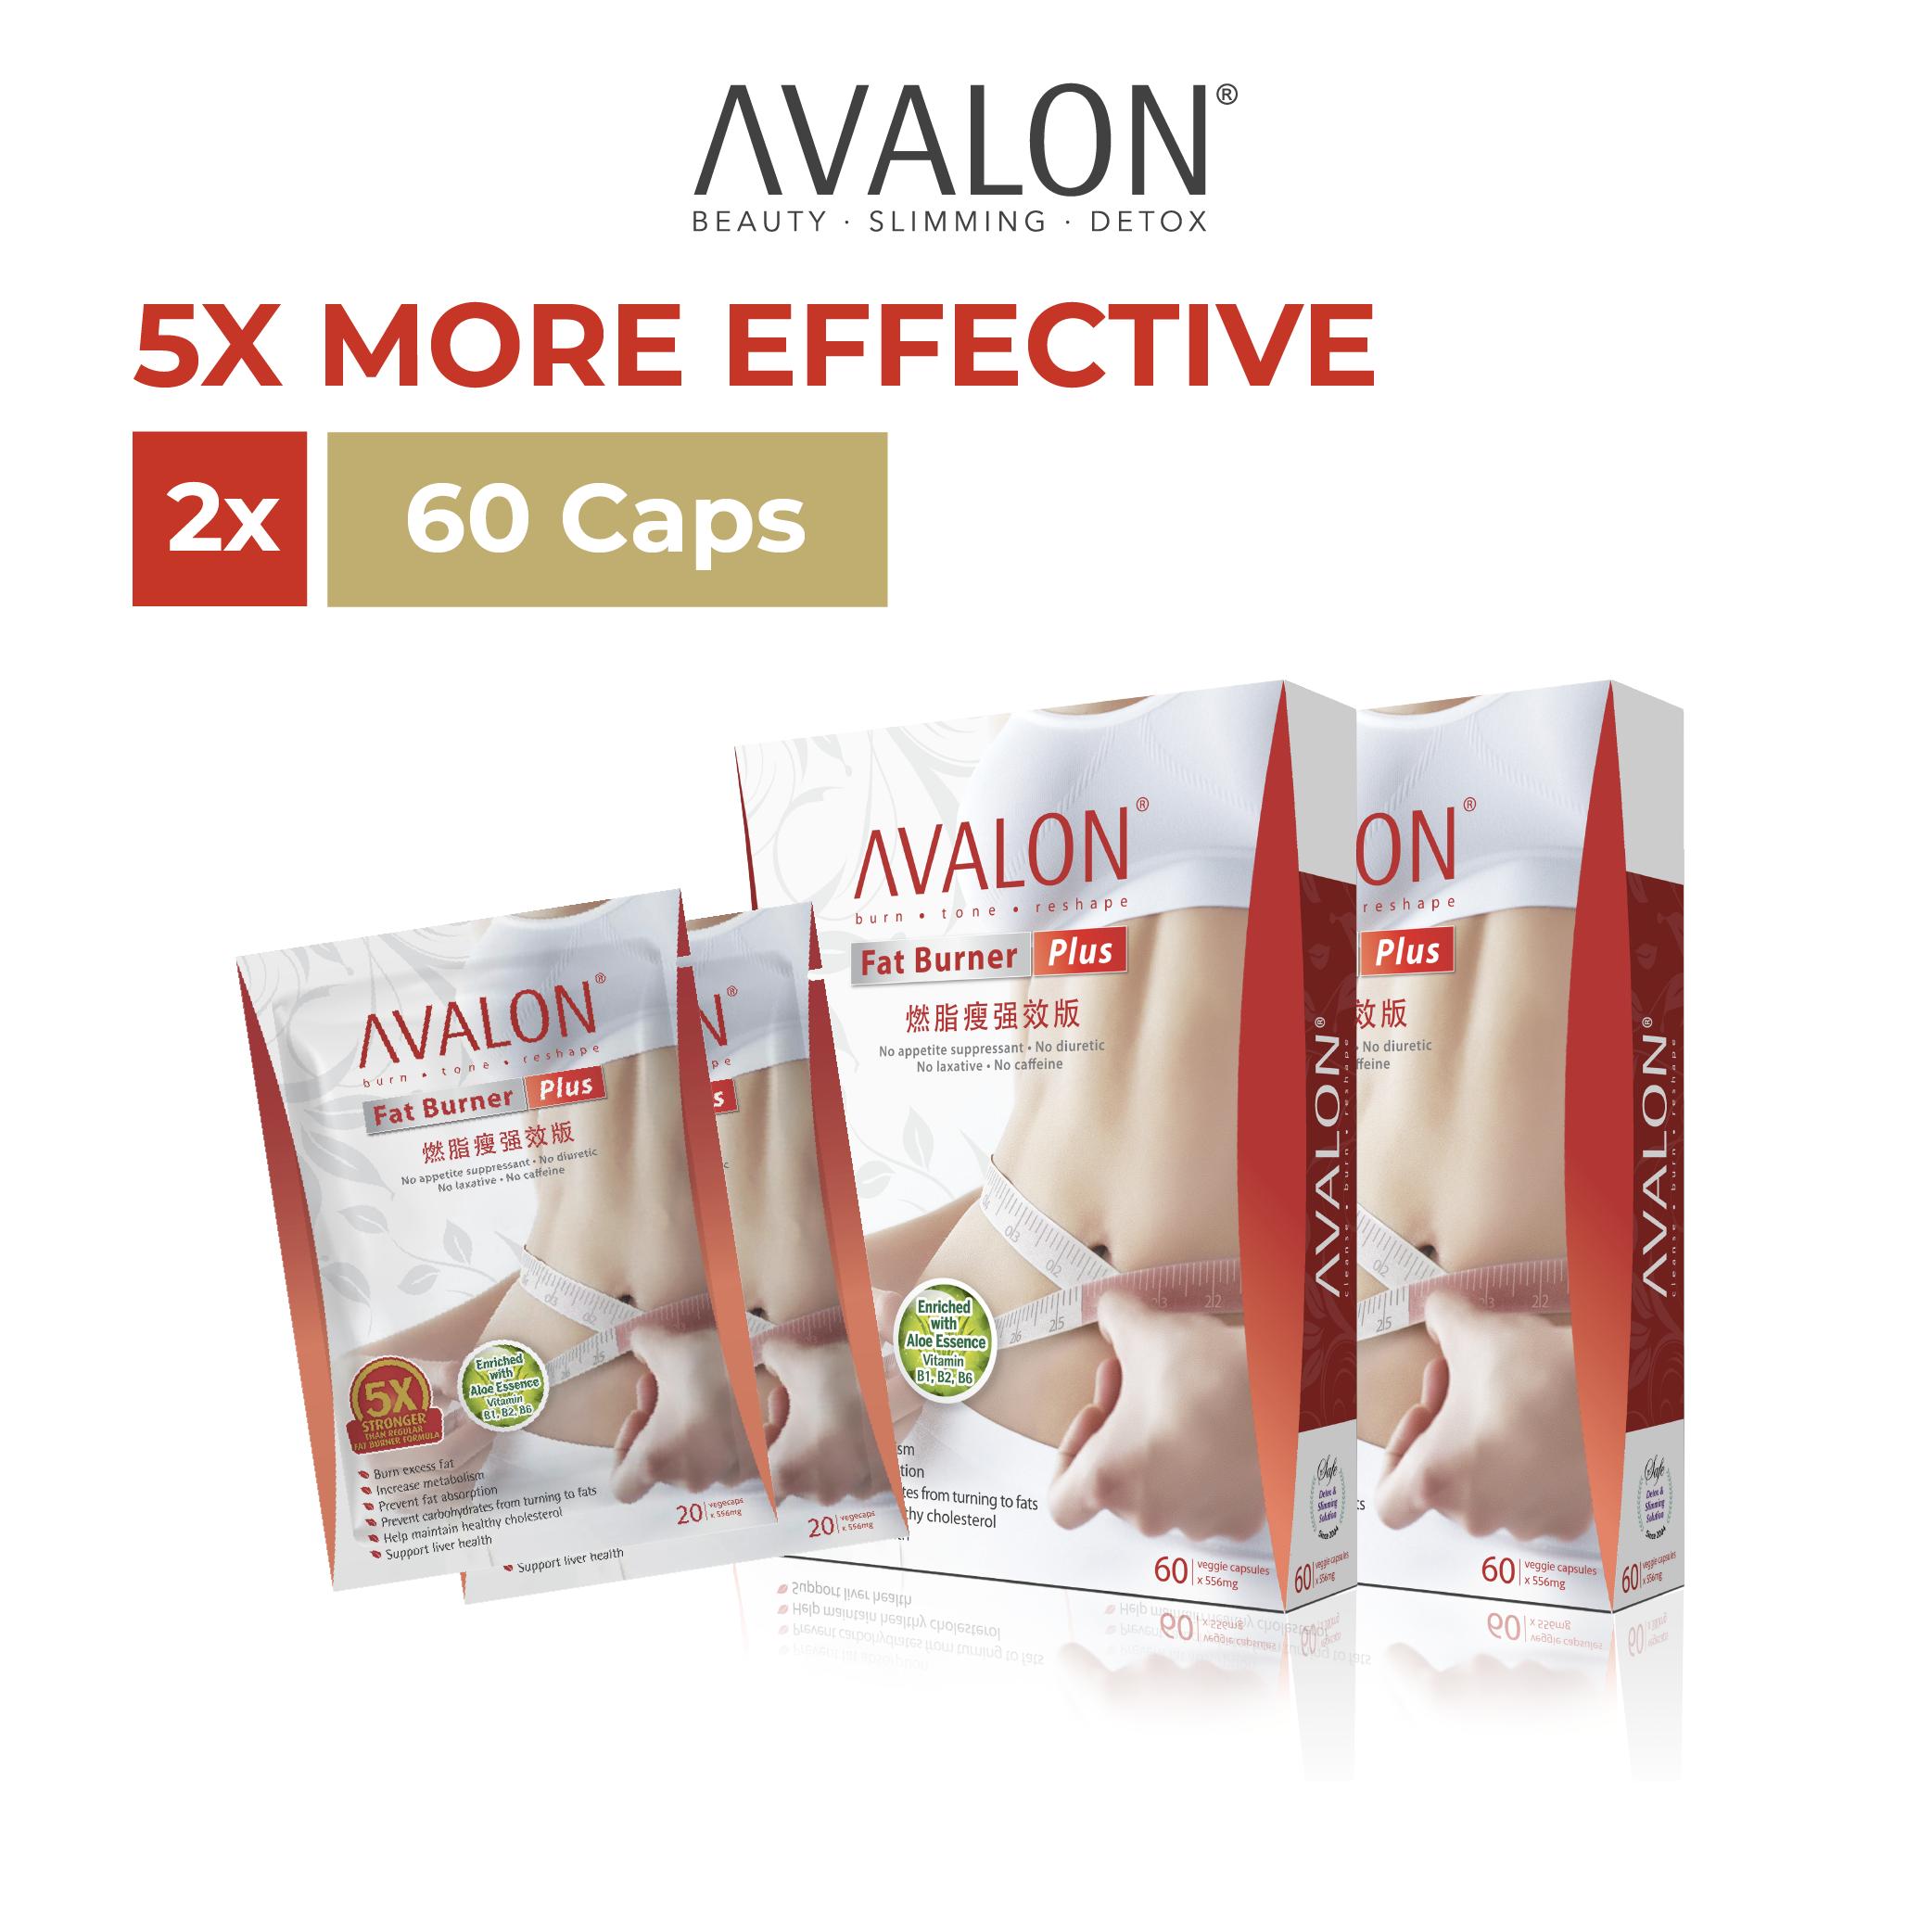 Avalon Fat Burner Plus Spark kaalulangus app